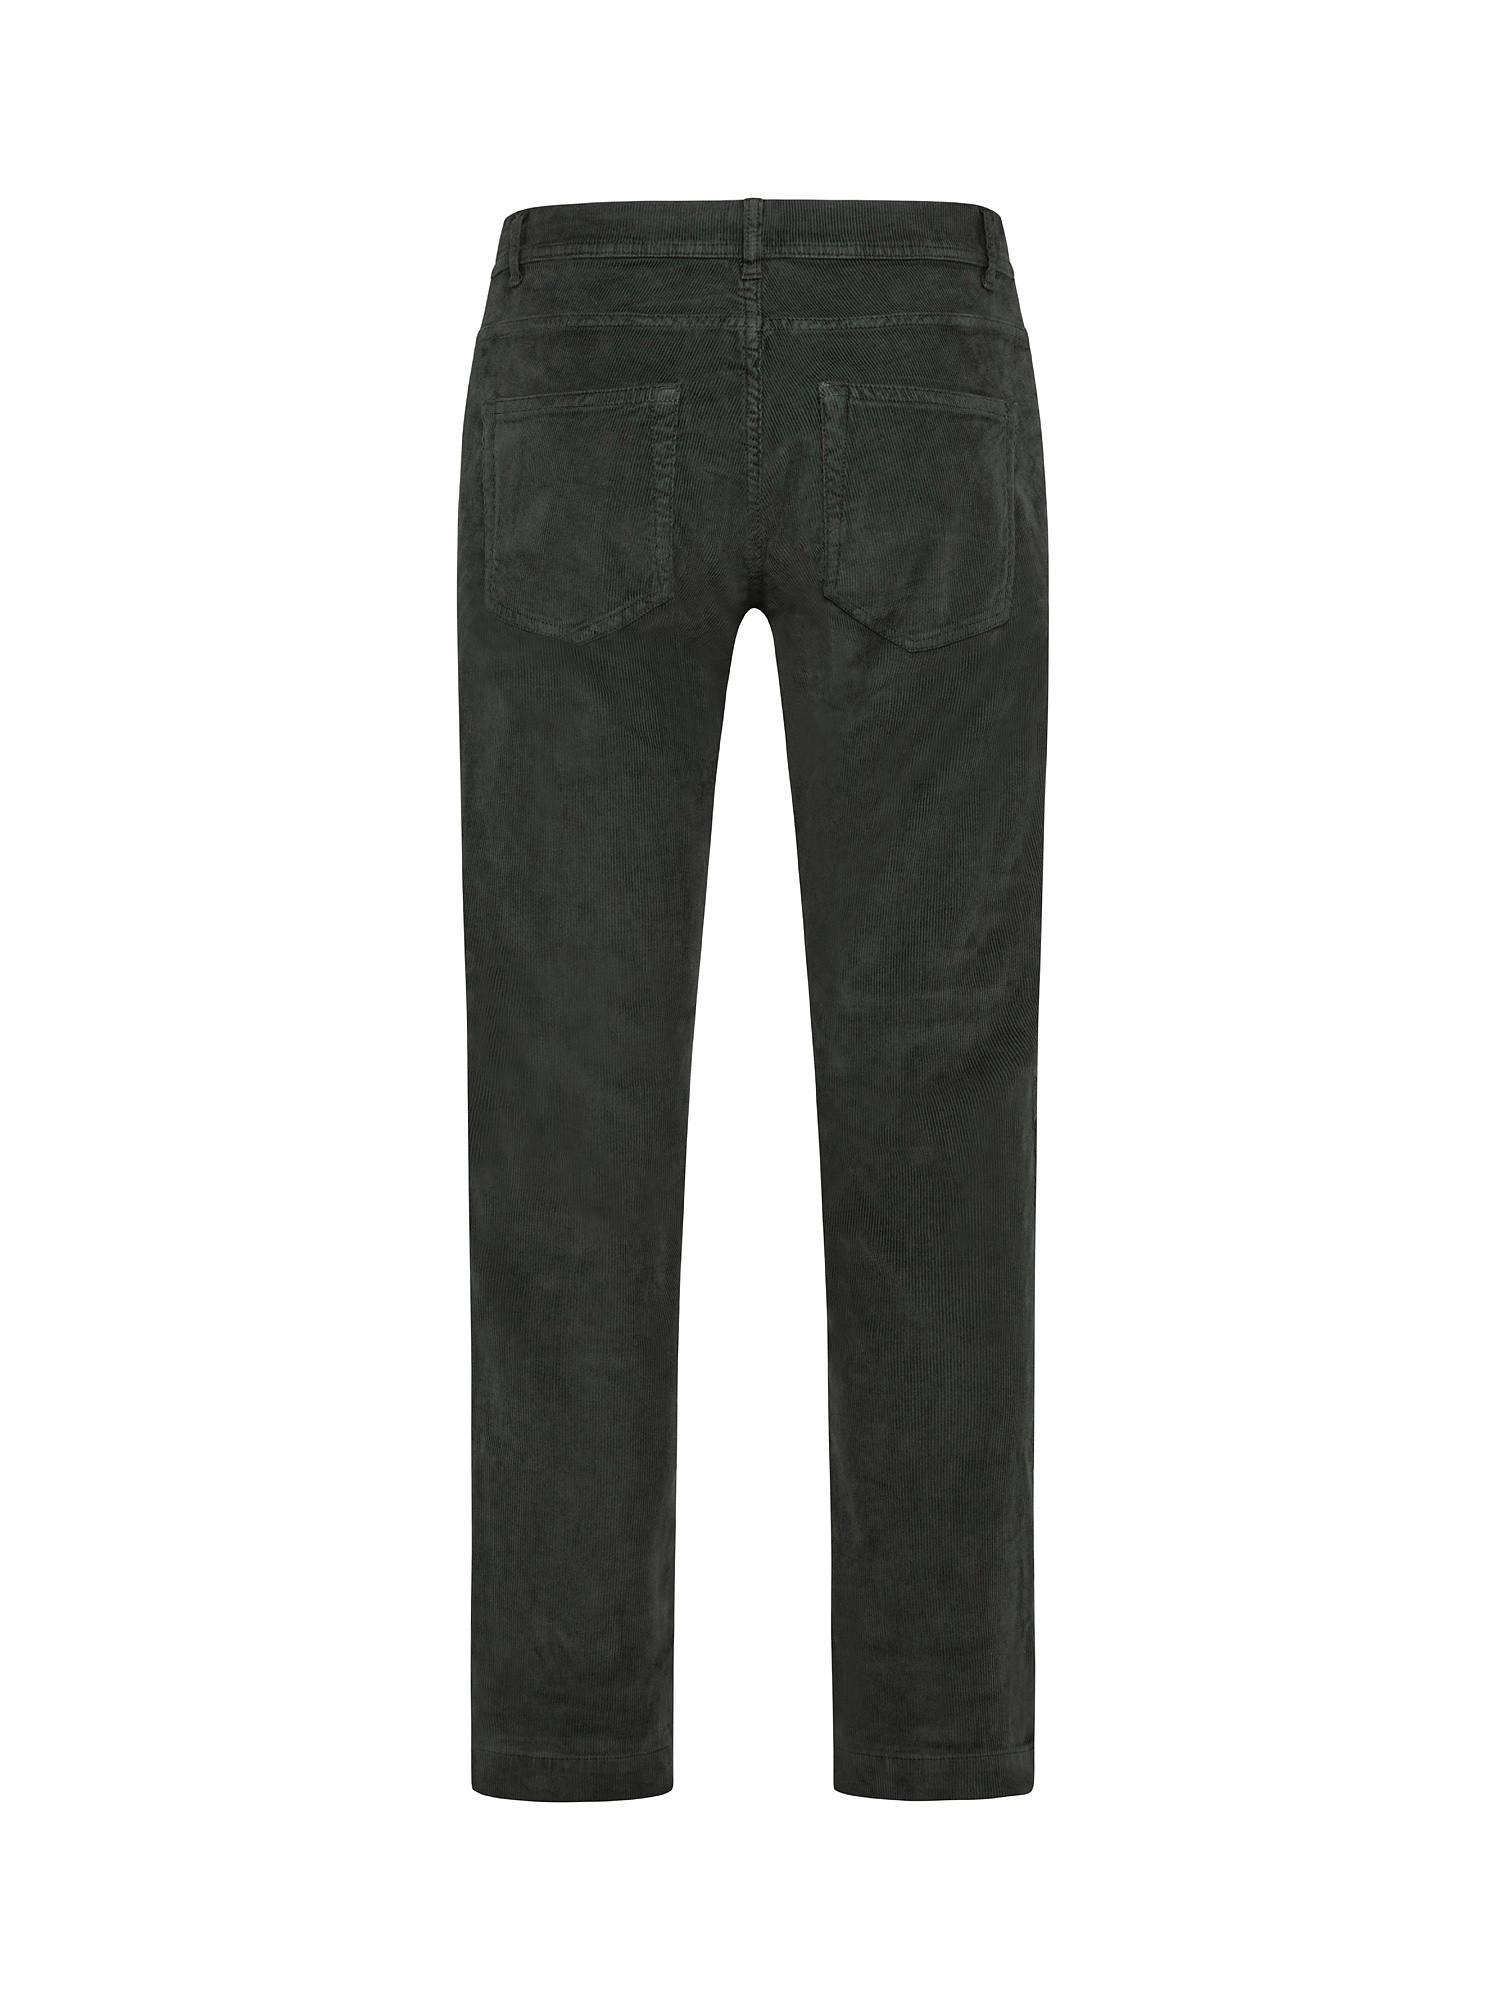 Pantalone 5 tasche, Nero, large image number 1